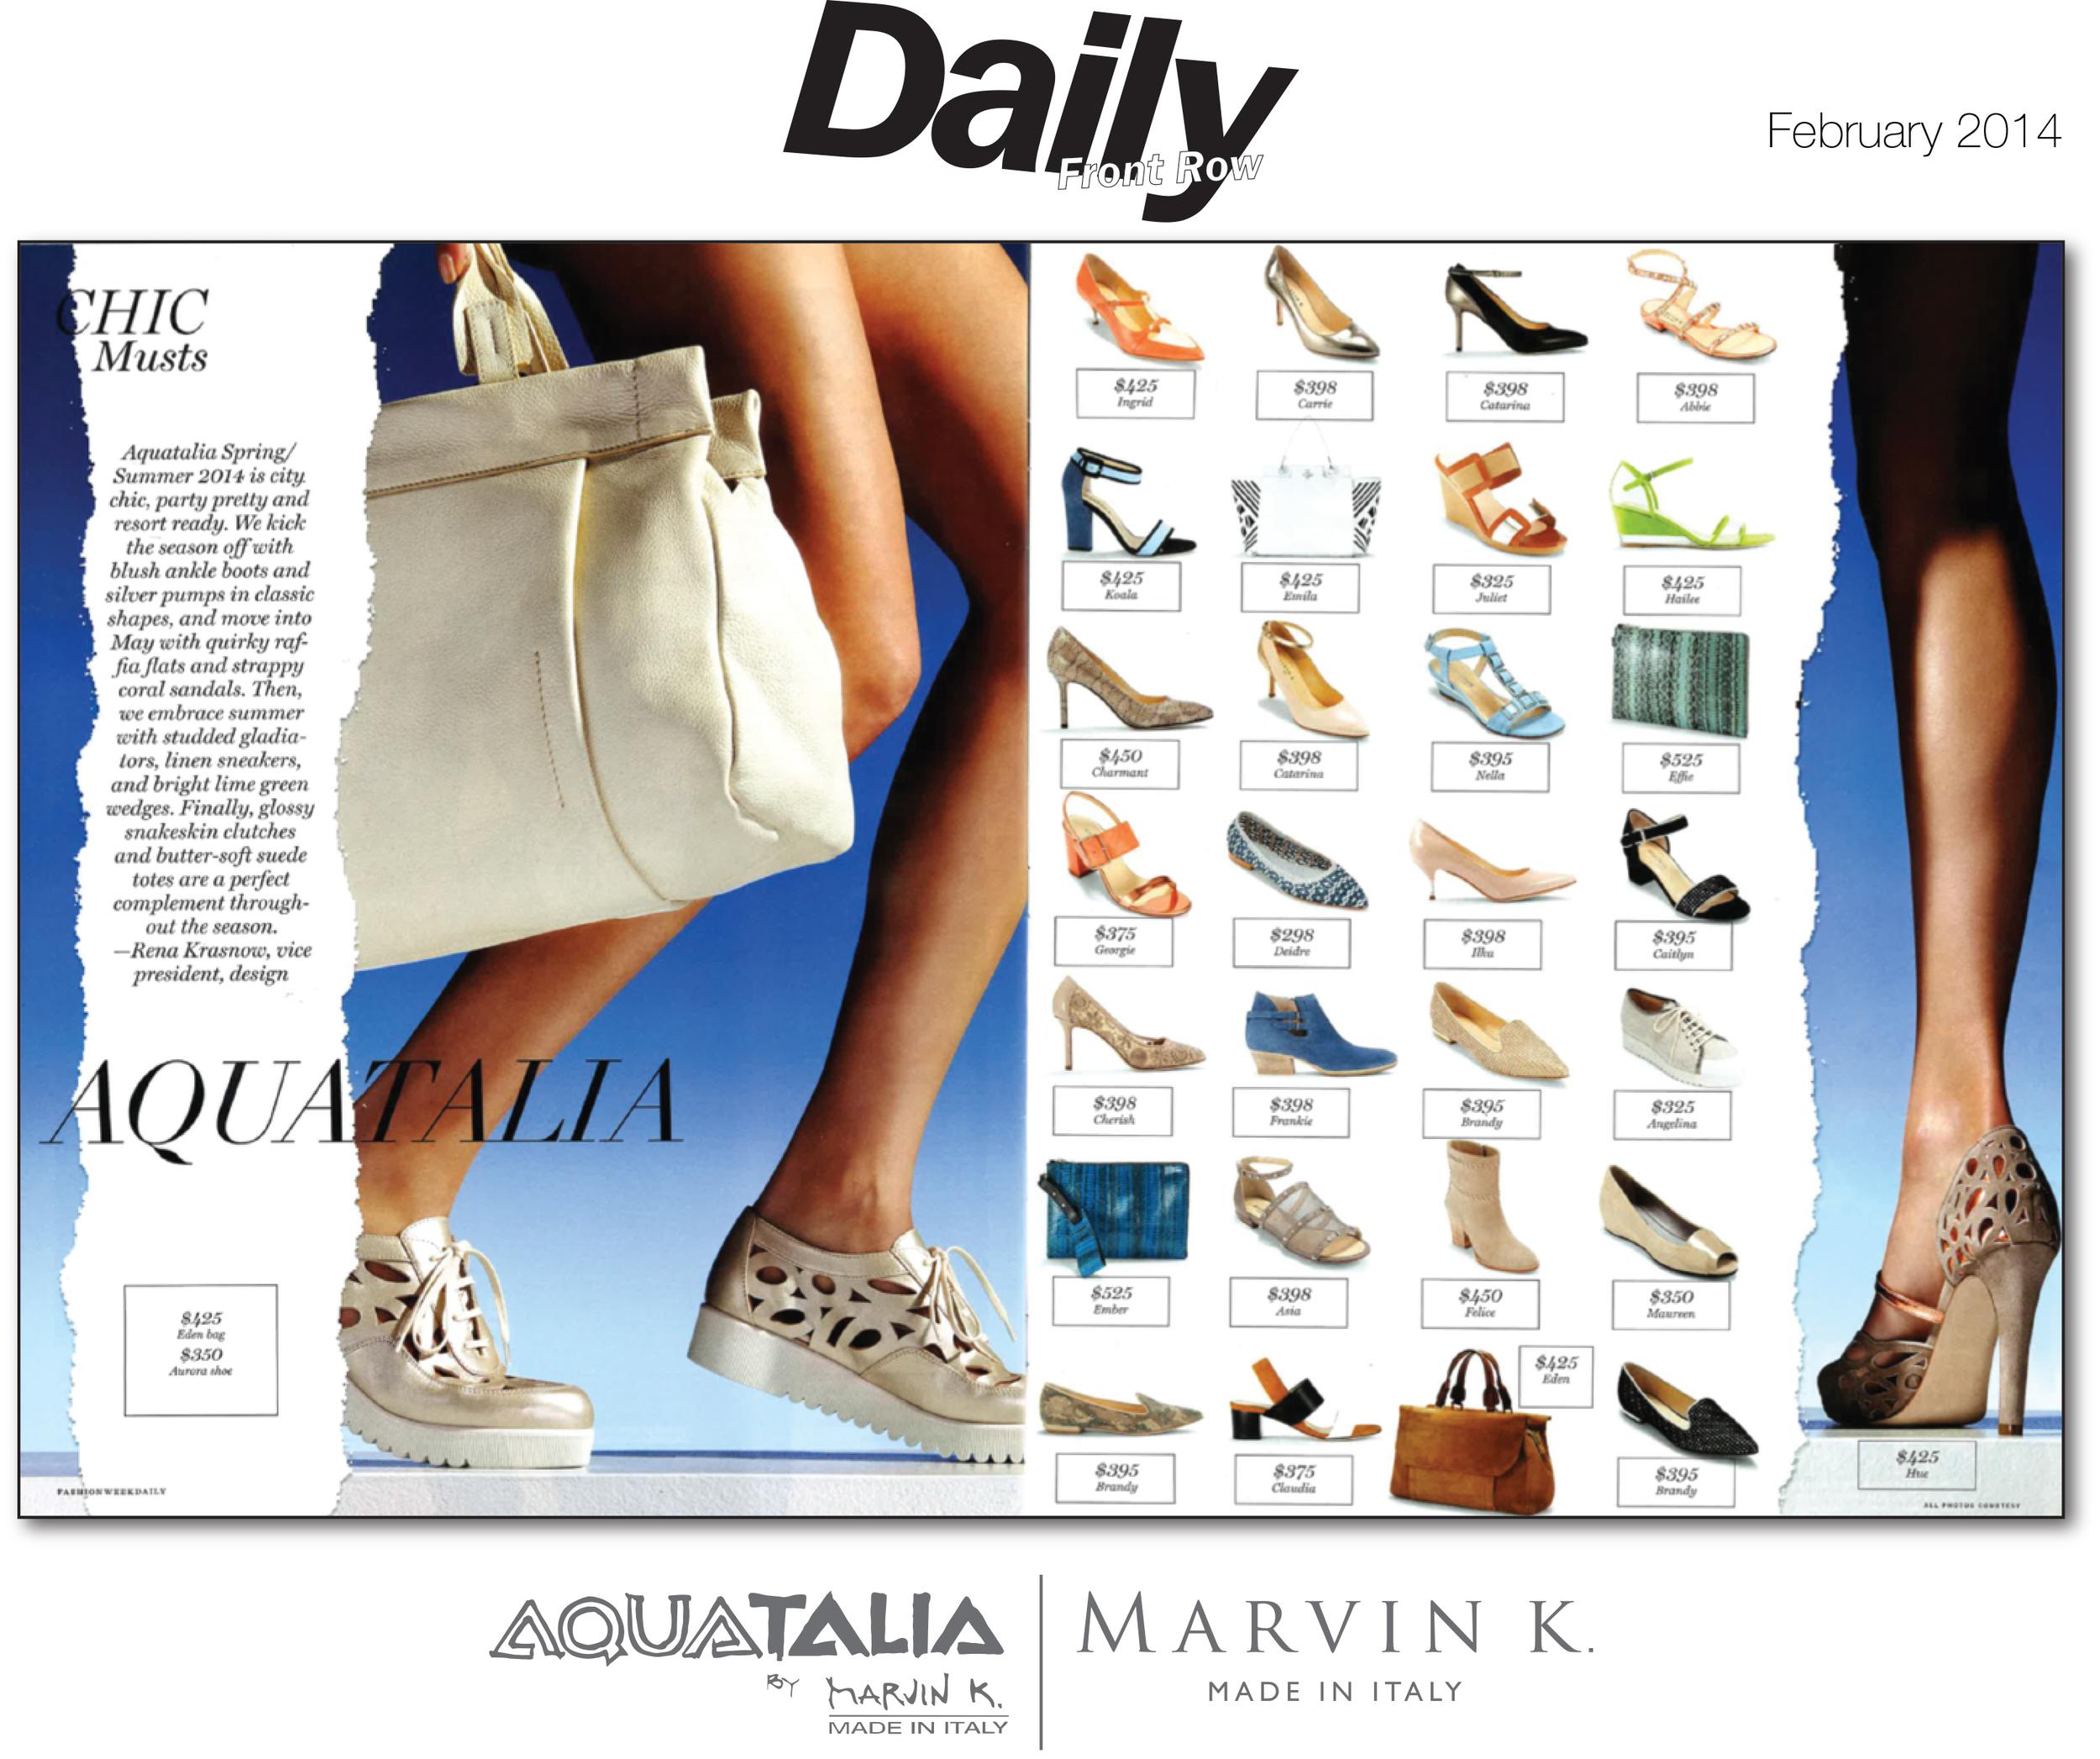 Aquatalia by Marvin K | Daily Front Row